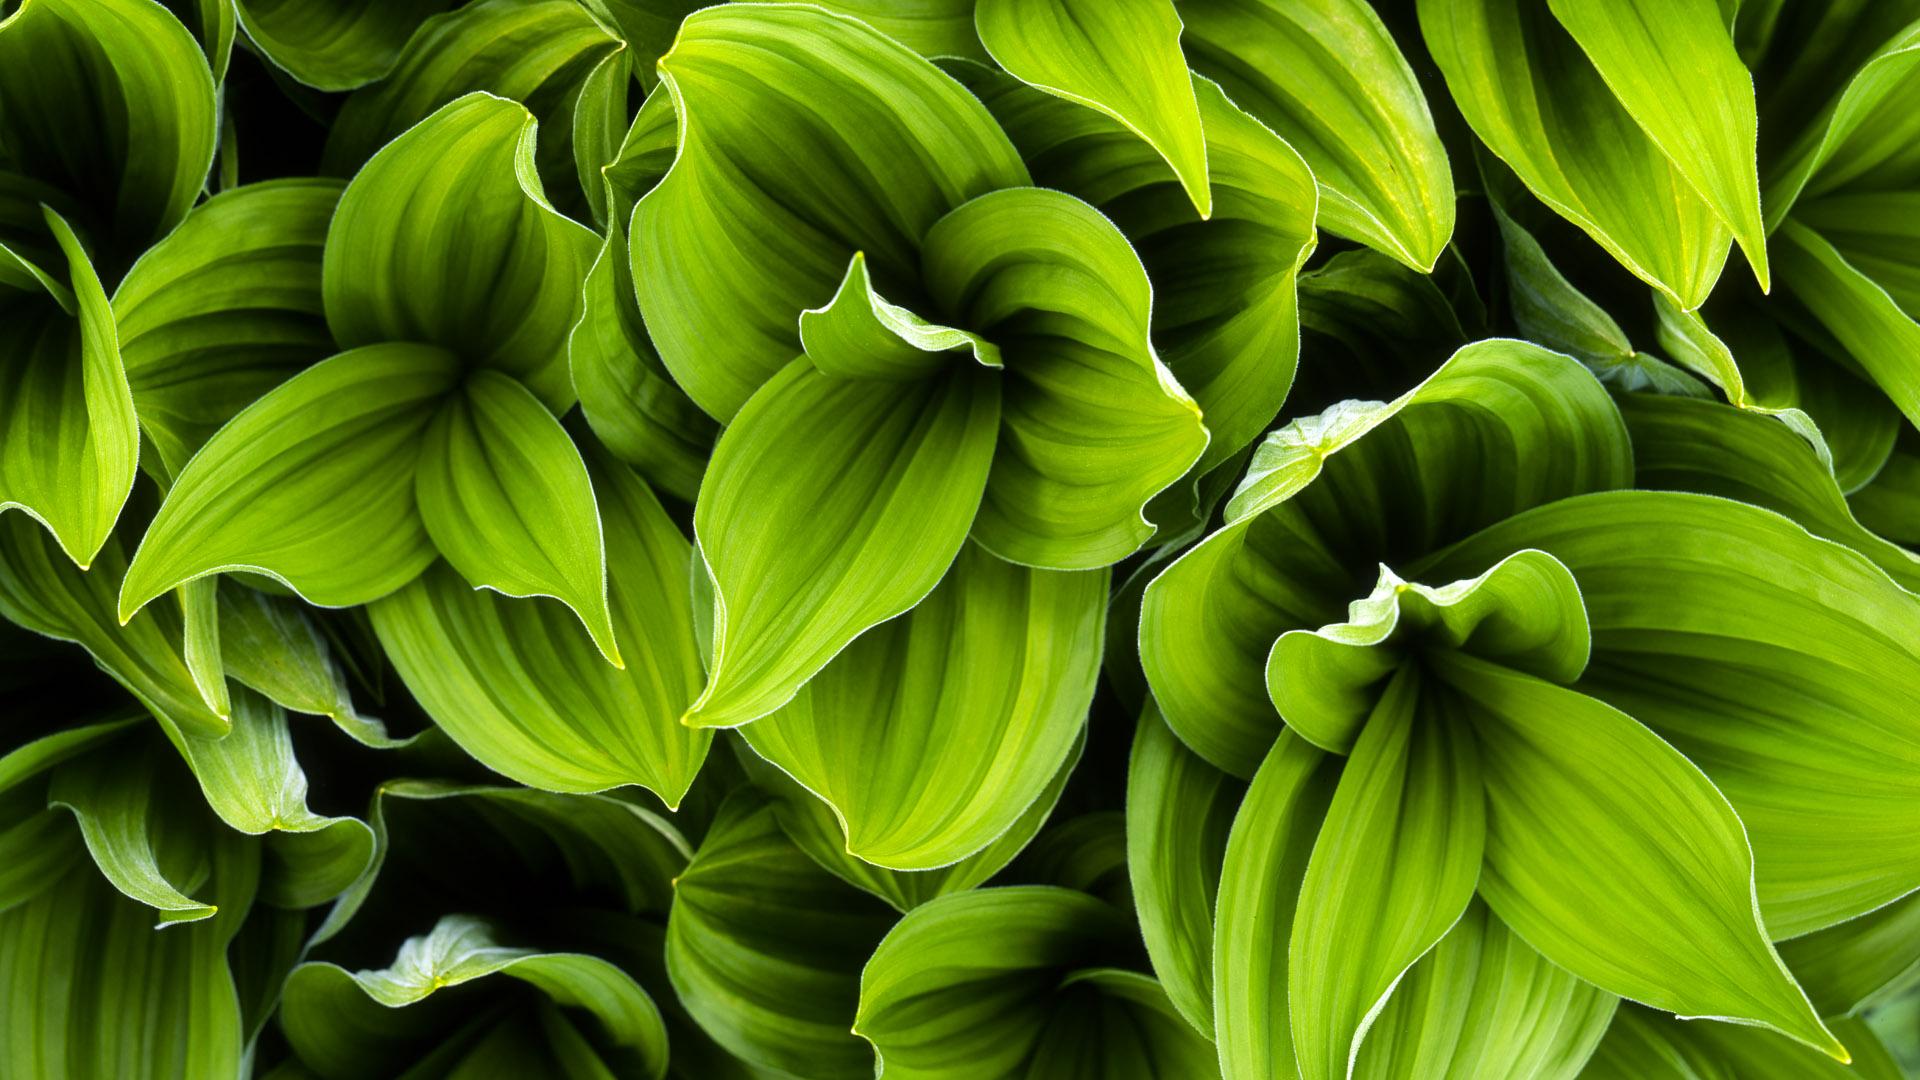 plants amp flowers wallpaper supportmicrosoftcom